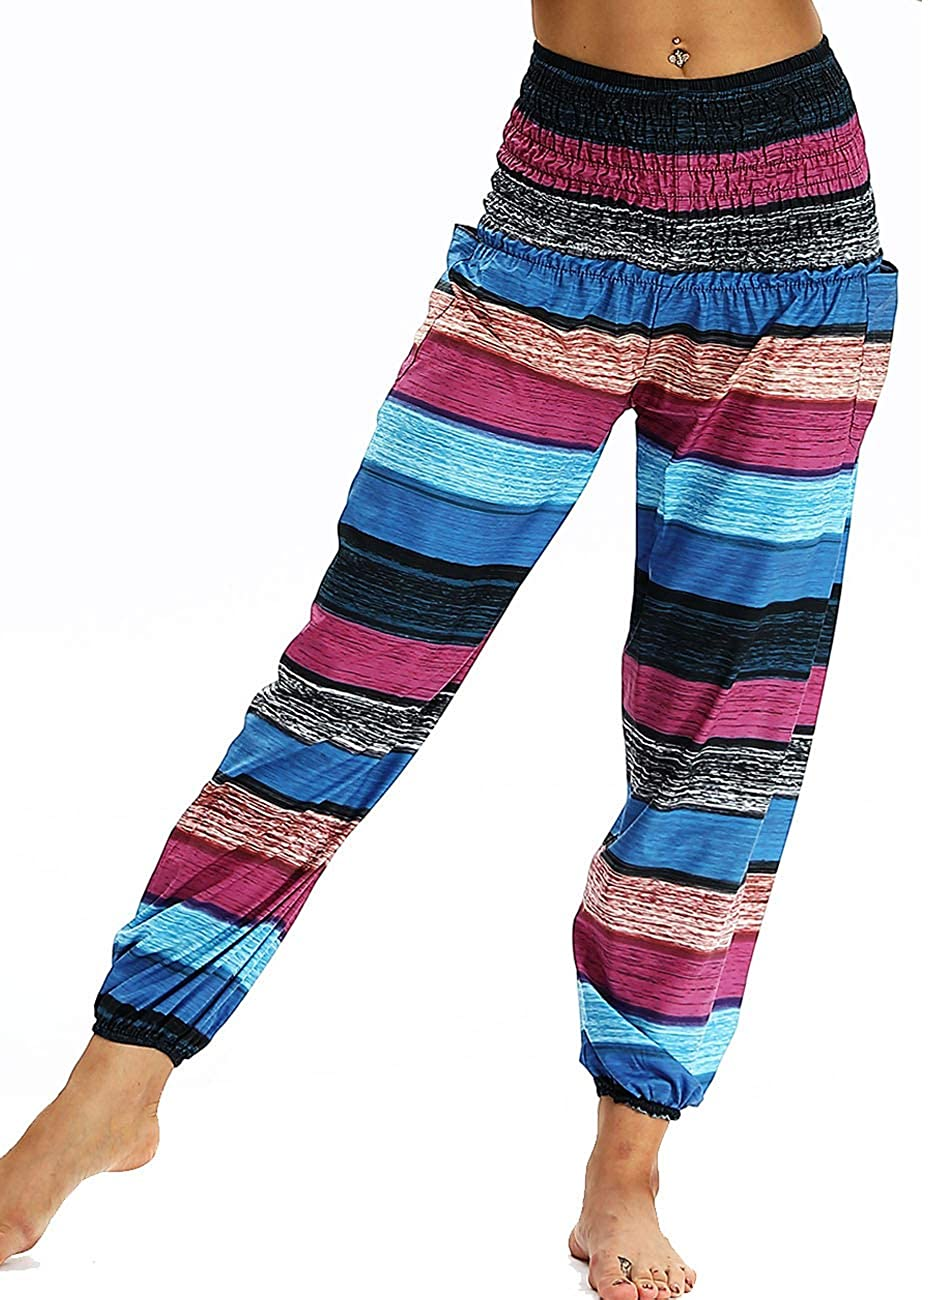 Leezeshaw Women Bohemian Stripes Print Smocked Waist Harem Hippie Yoga Pants Free Size with Pockets